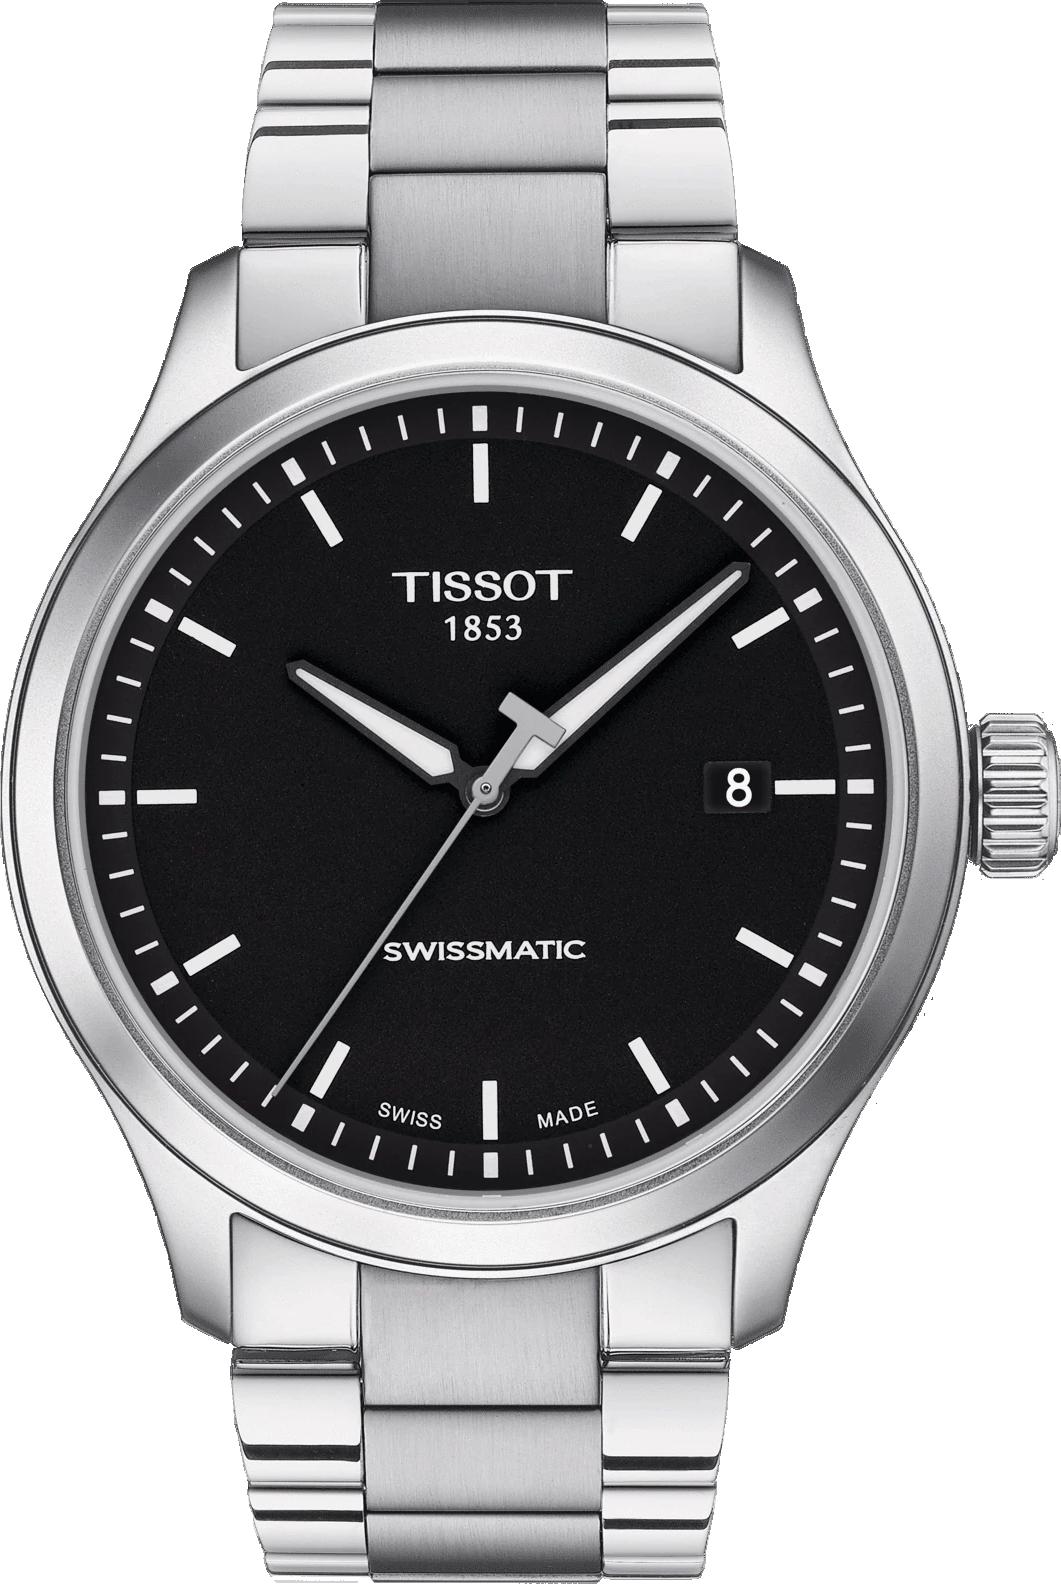 Tissot T116.407.11.051.00